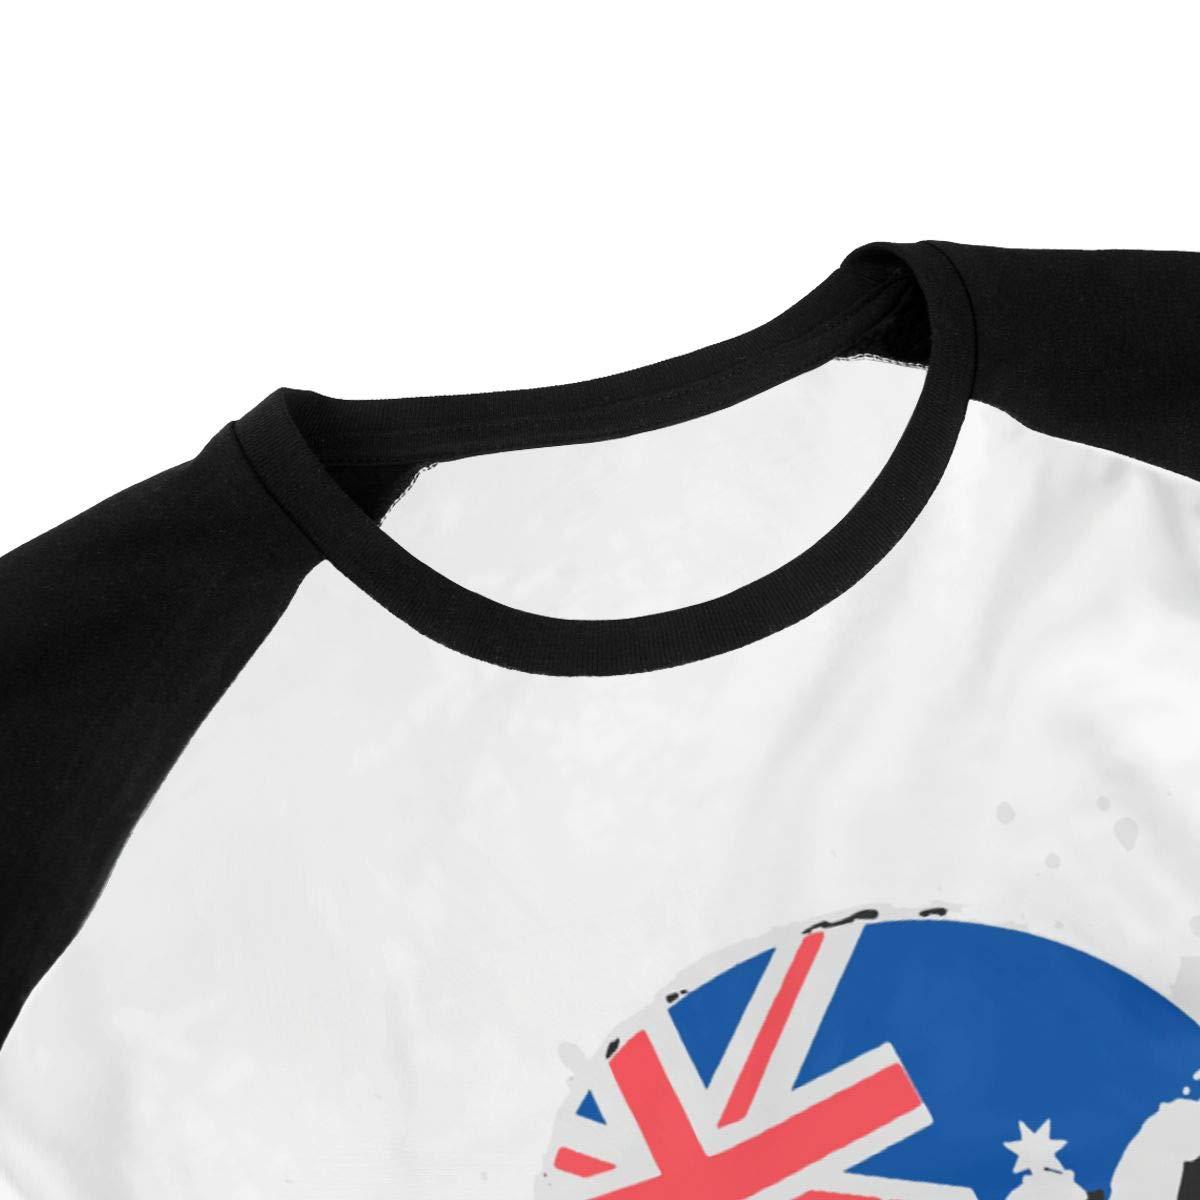 Teens Boys Girls Lazar-Beam Sleeve T-Shirt Fashion Youth Shirt